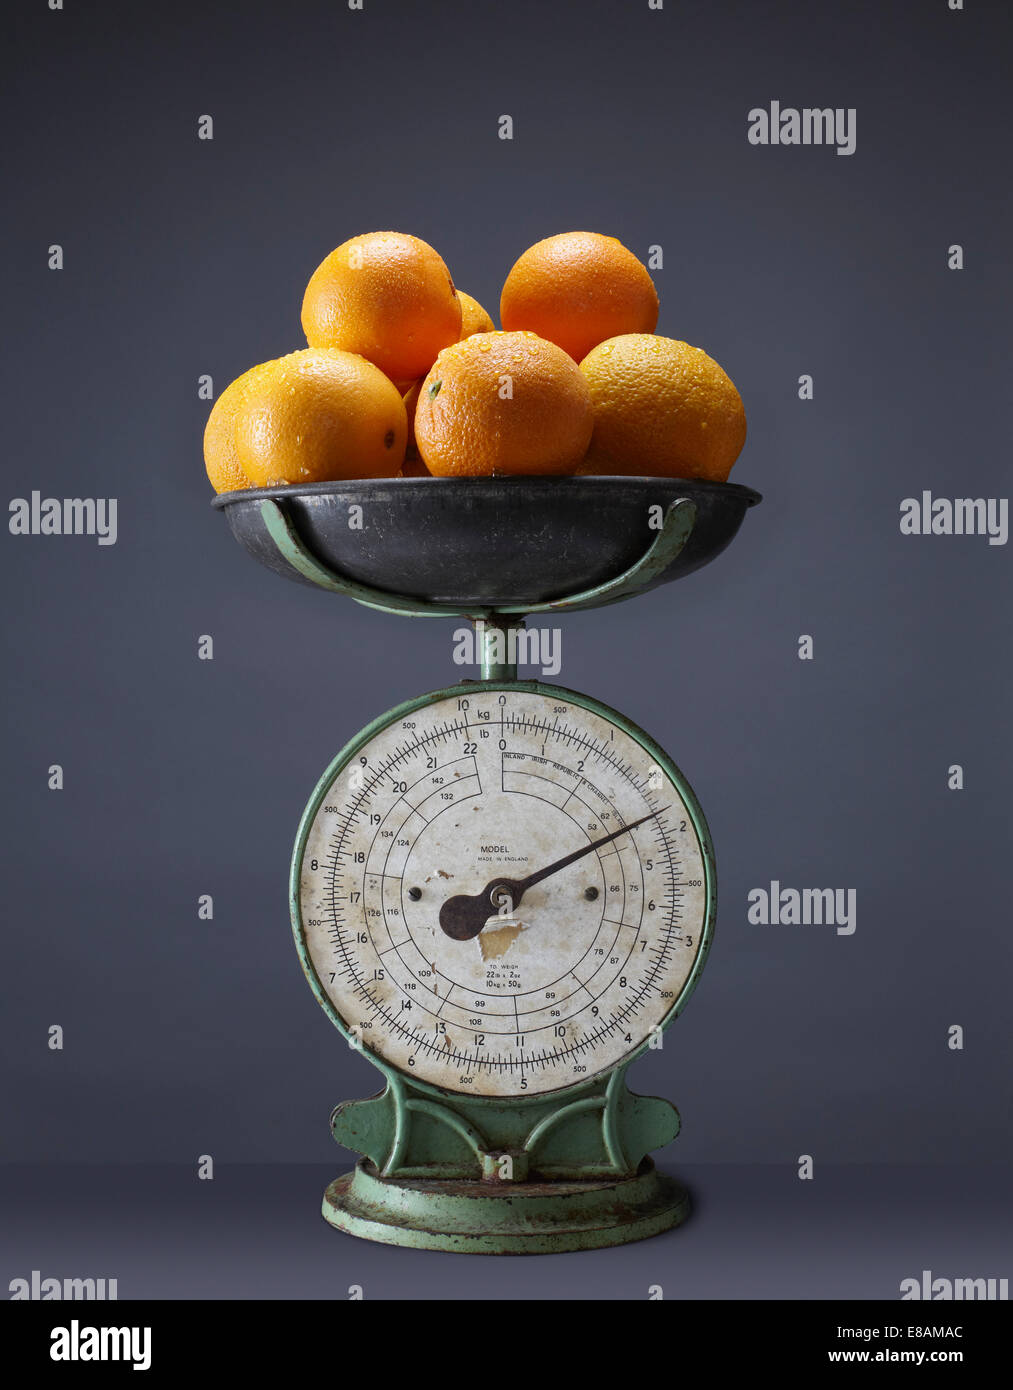 Fresh oranges on top of vintage kitchen scales - Stock Image